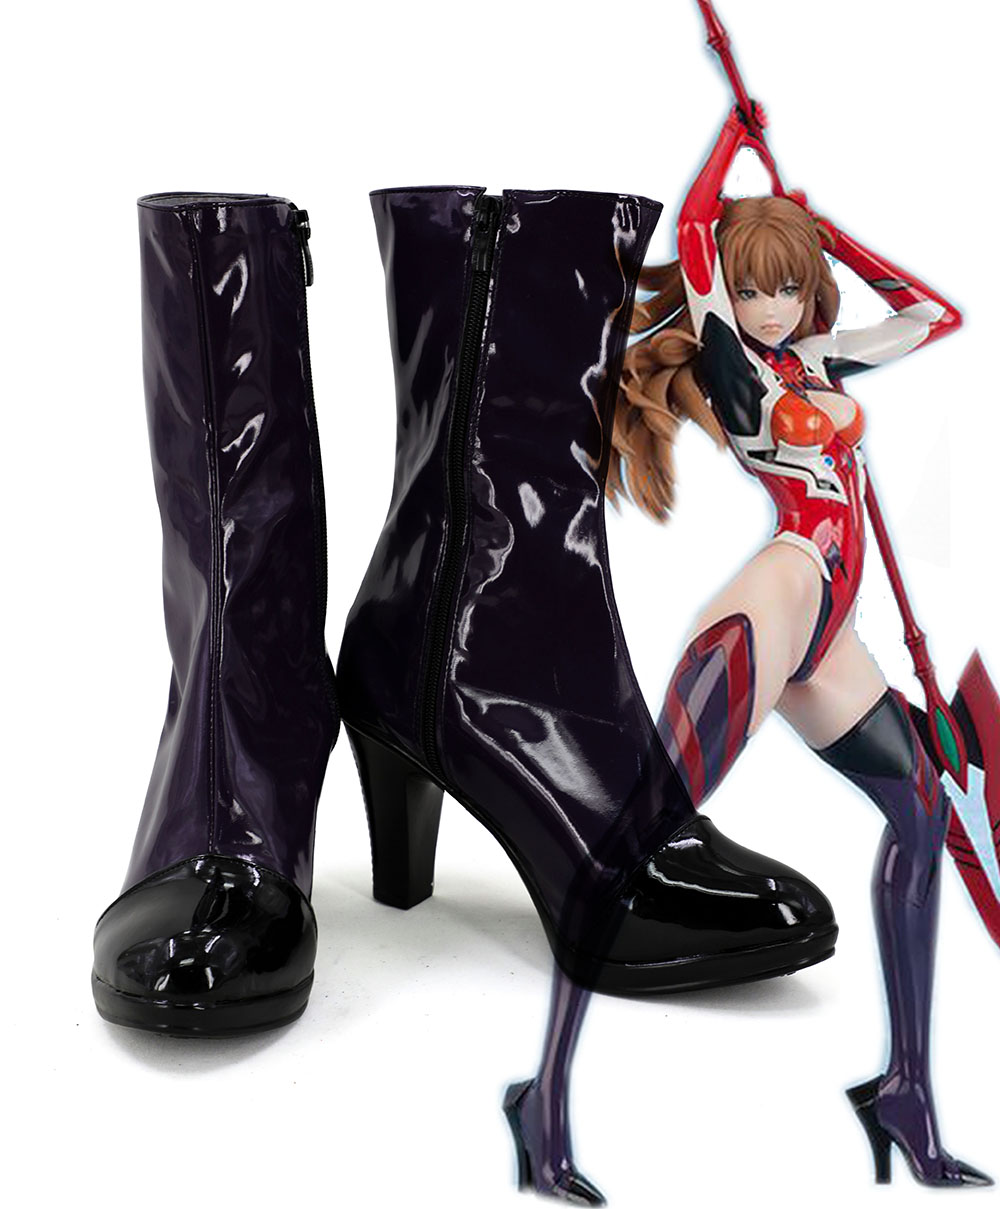 Neon Genesis Evangelion EVA Asuka Langley Soryu Cosplay Boots Shoes Custom Made